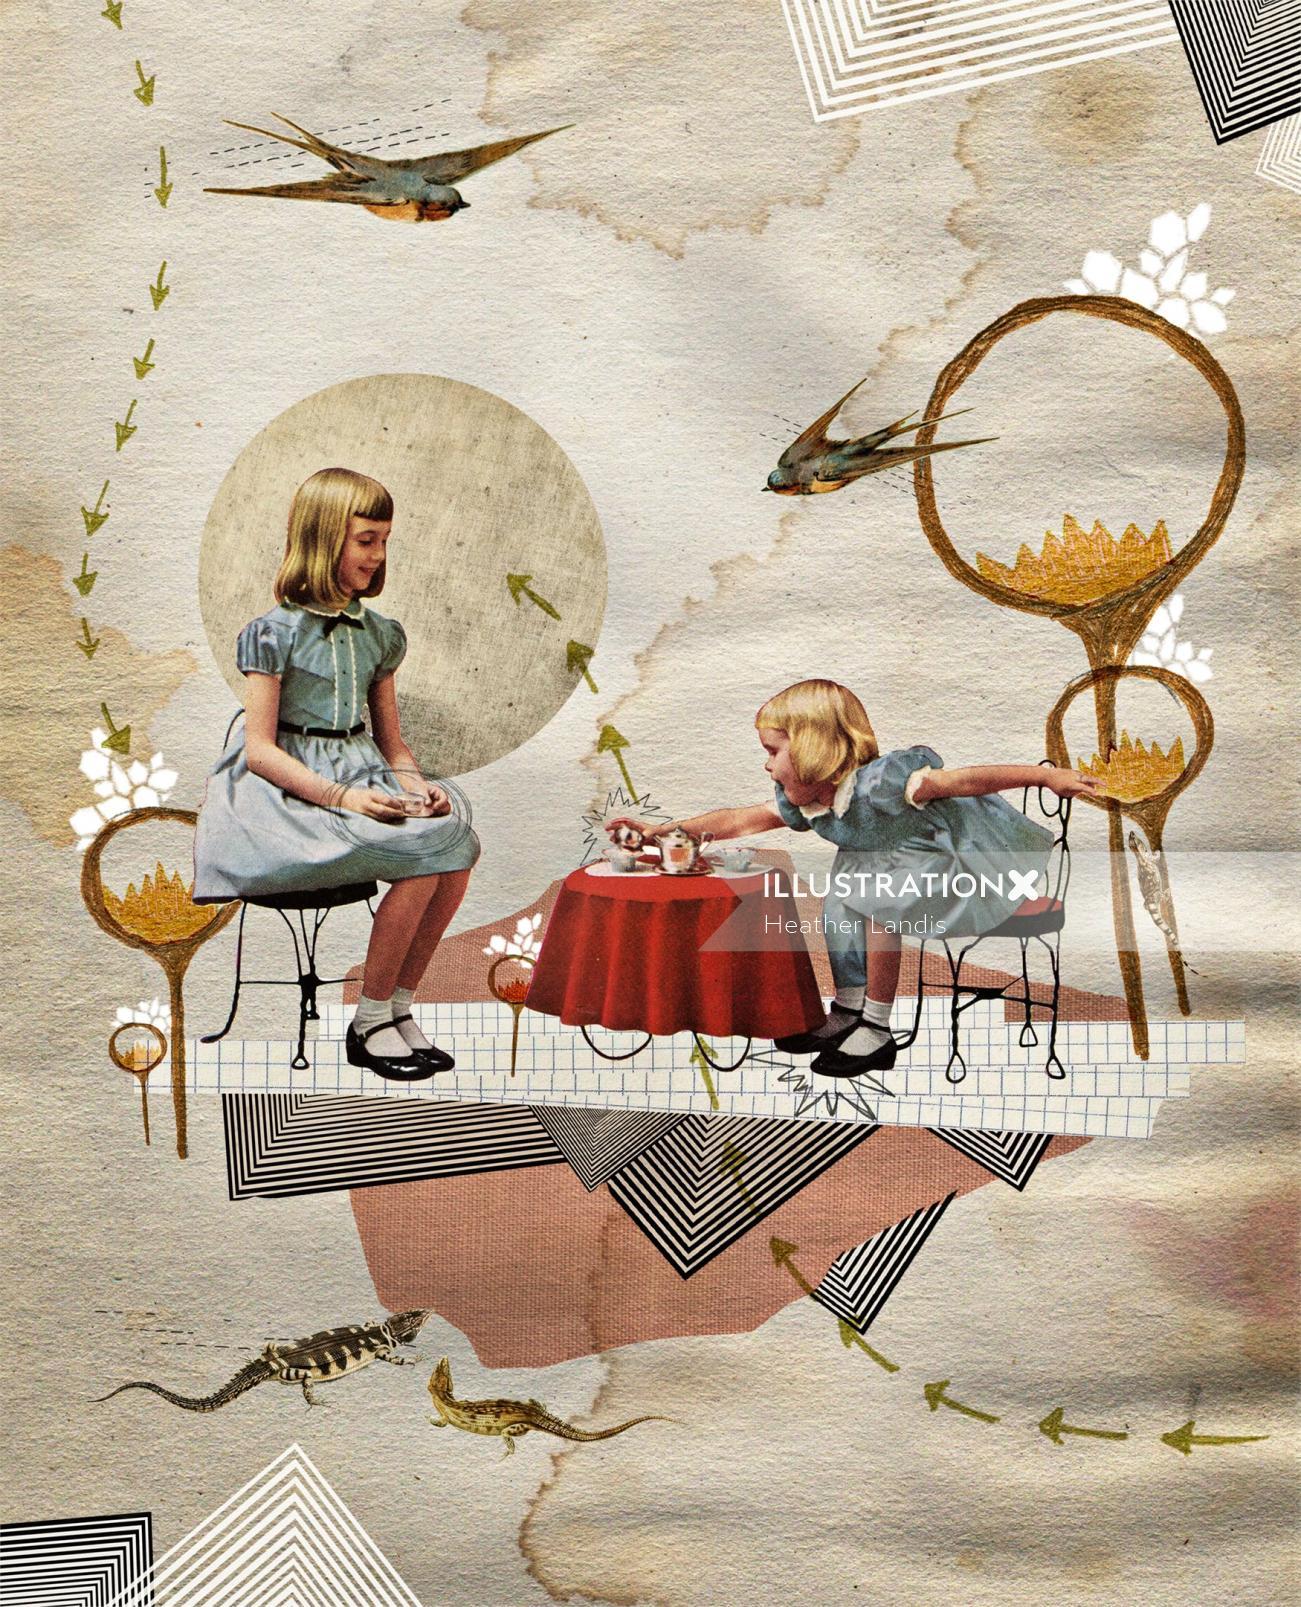 Girls playing illustration by Heather Landis